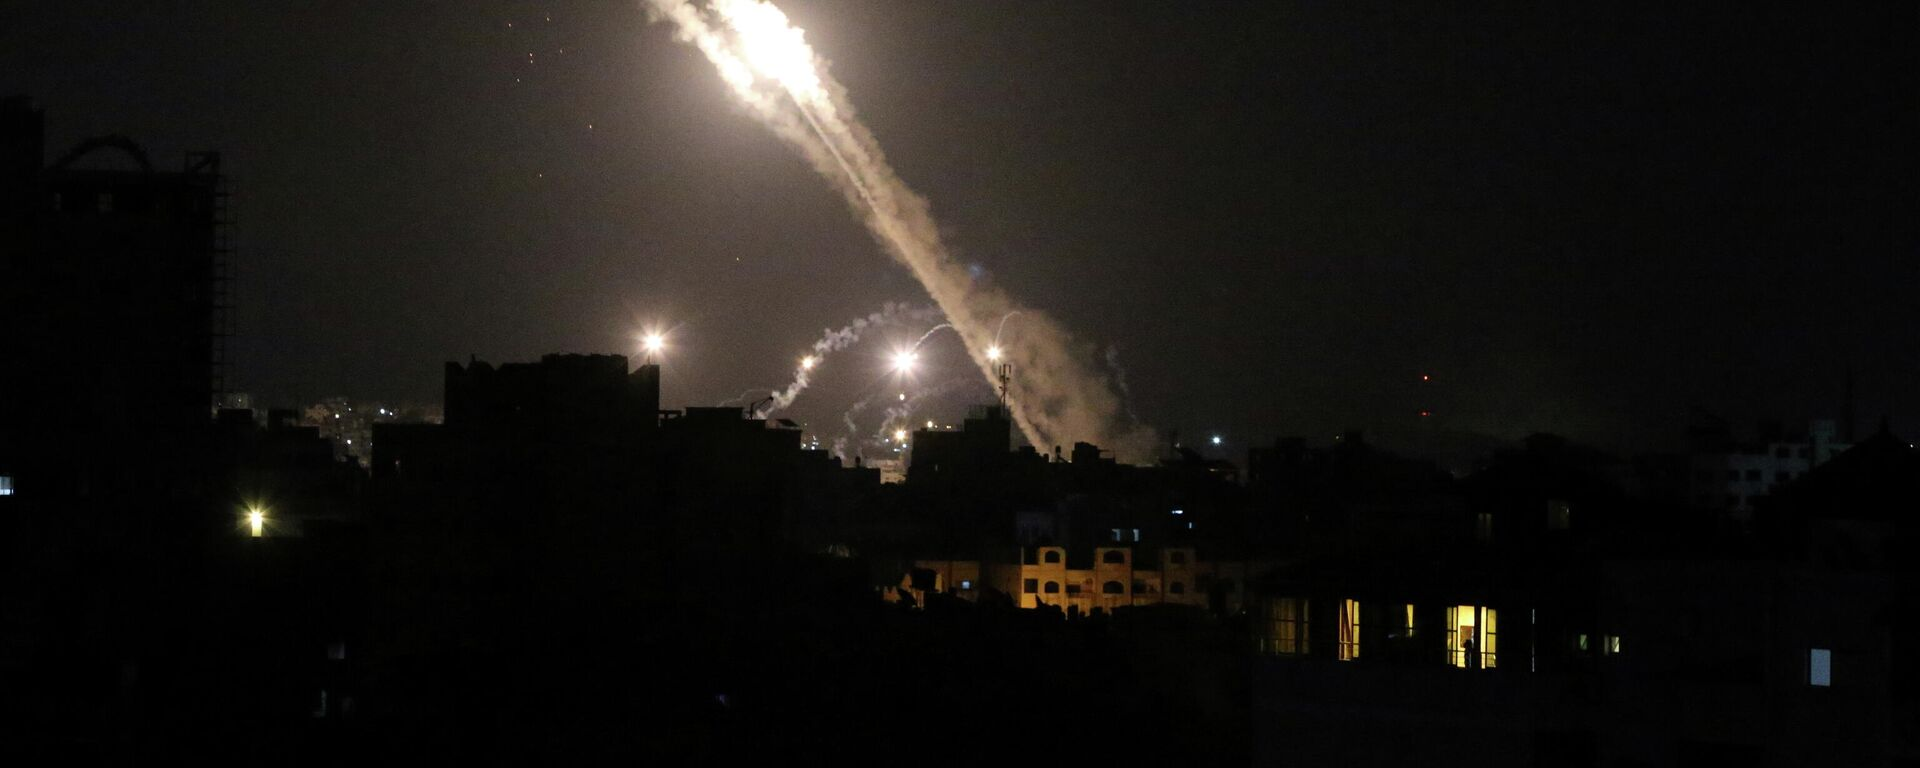 Raketenangriff auf Israel  - SNA, 1920, 13.05.2021